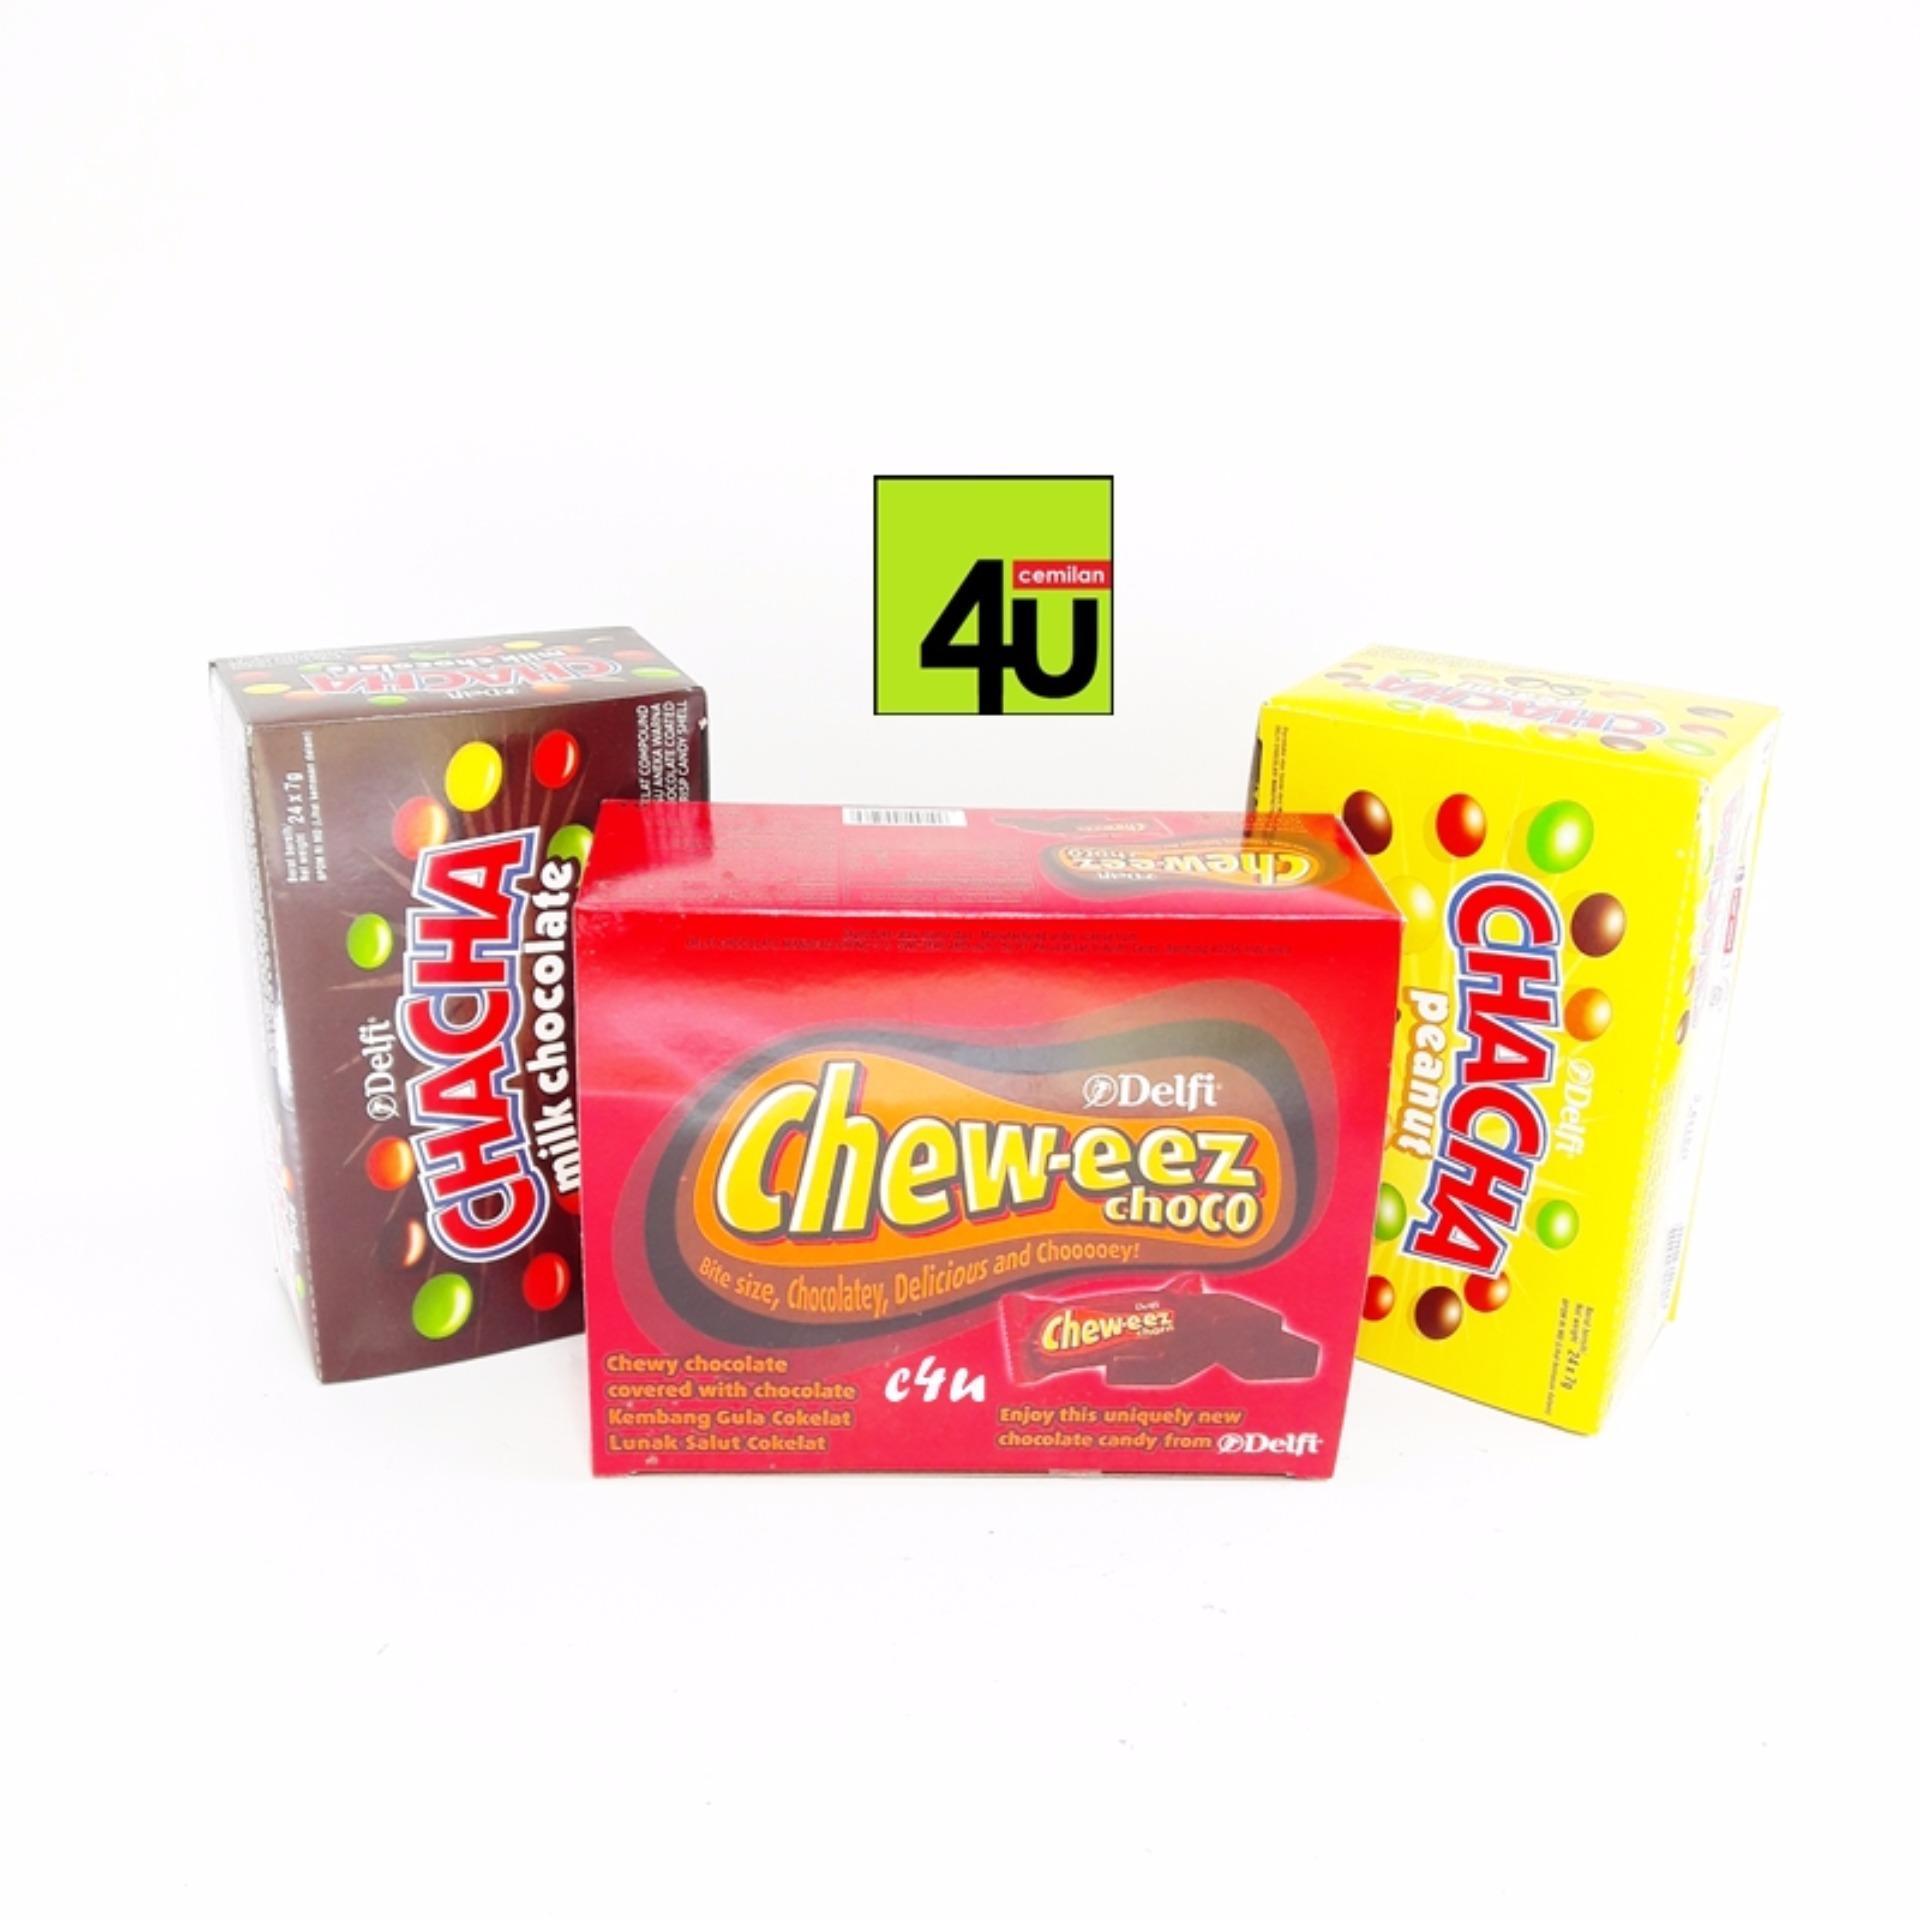 Coklat Delfi Kiloan Treasure Golden Almond 250gr Isi 24pcs Page 2 Chacha Milk Chocolate Dan Chew Eez Paket 3 Kotak